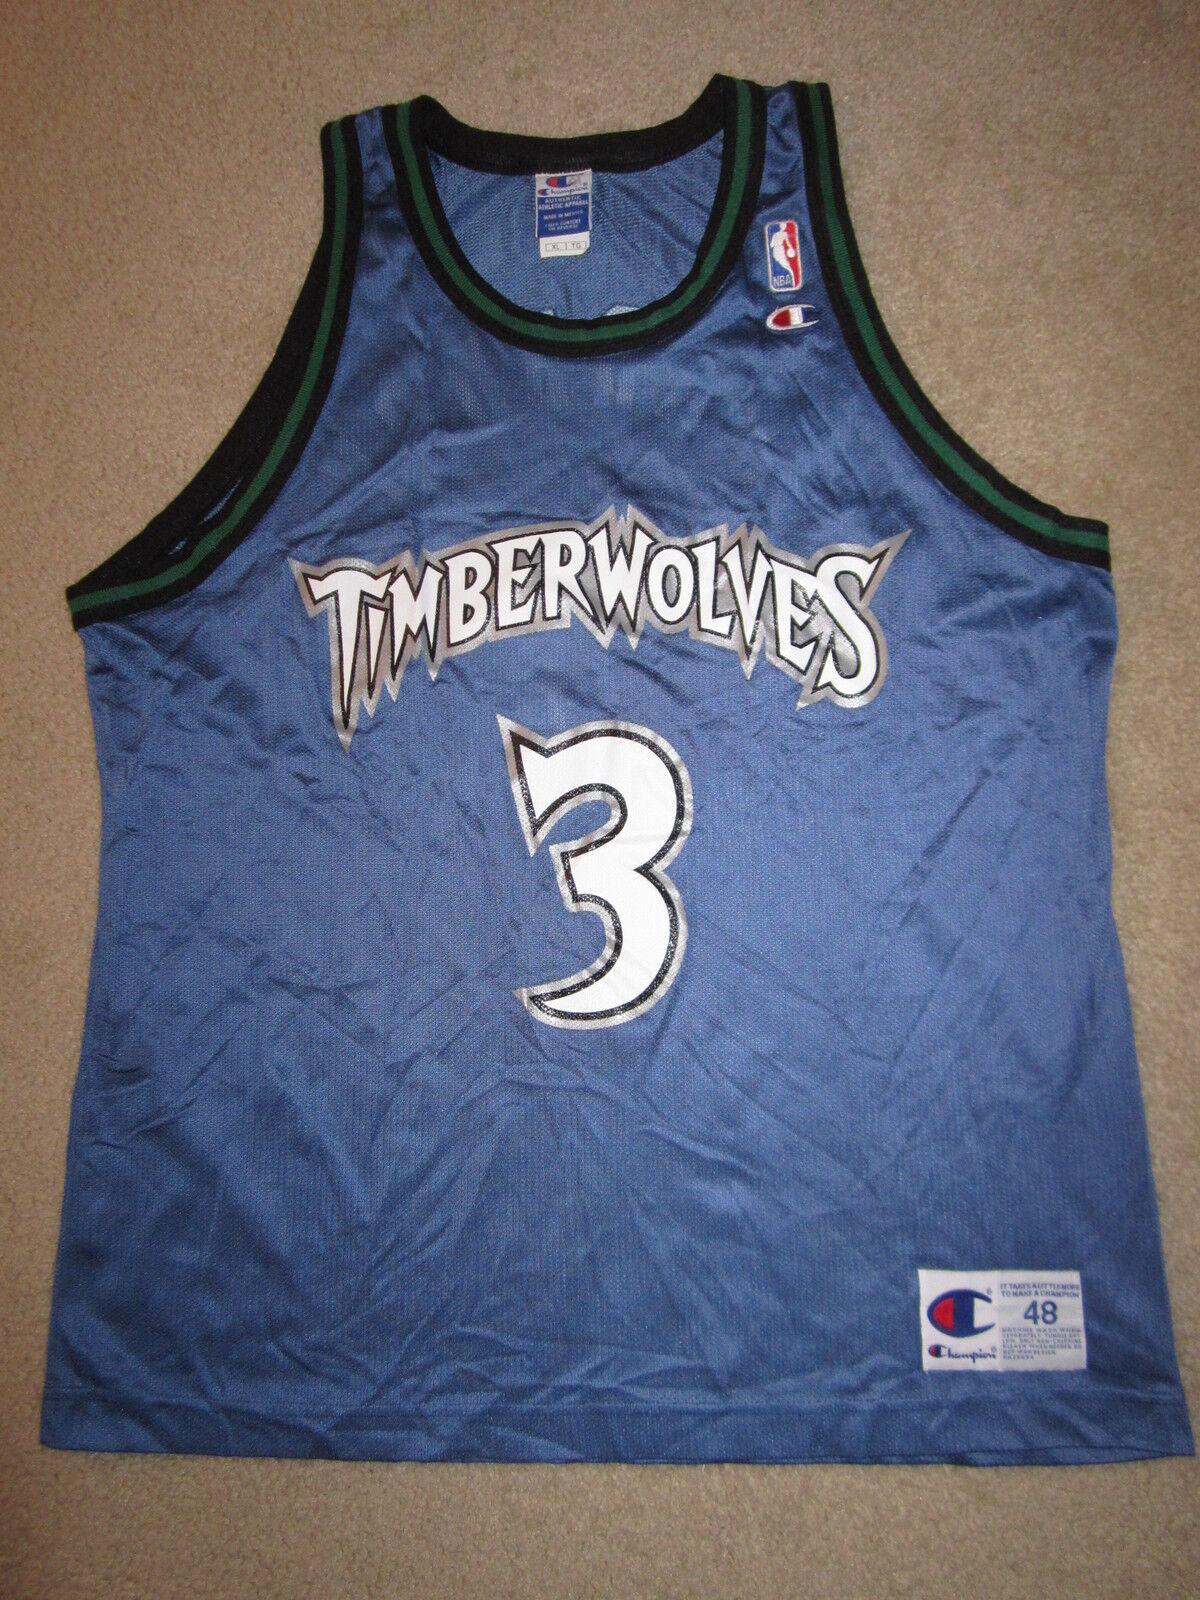 Stephon Marbury  3 Minnesota Timberwolves Champion Trikot 48 XL